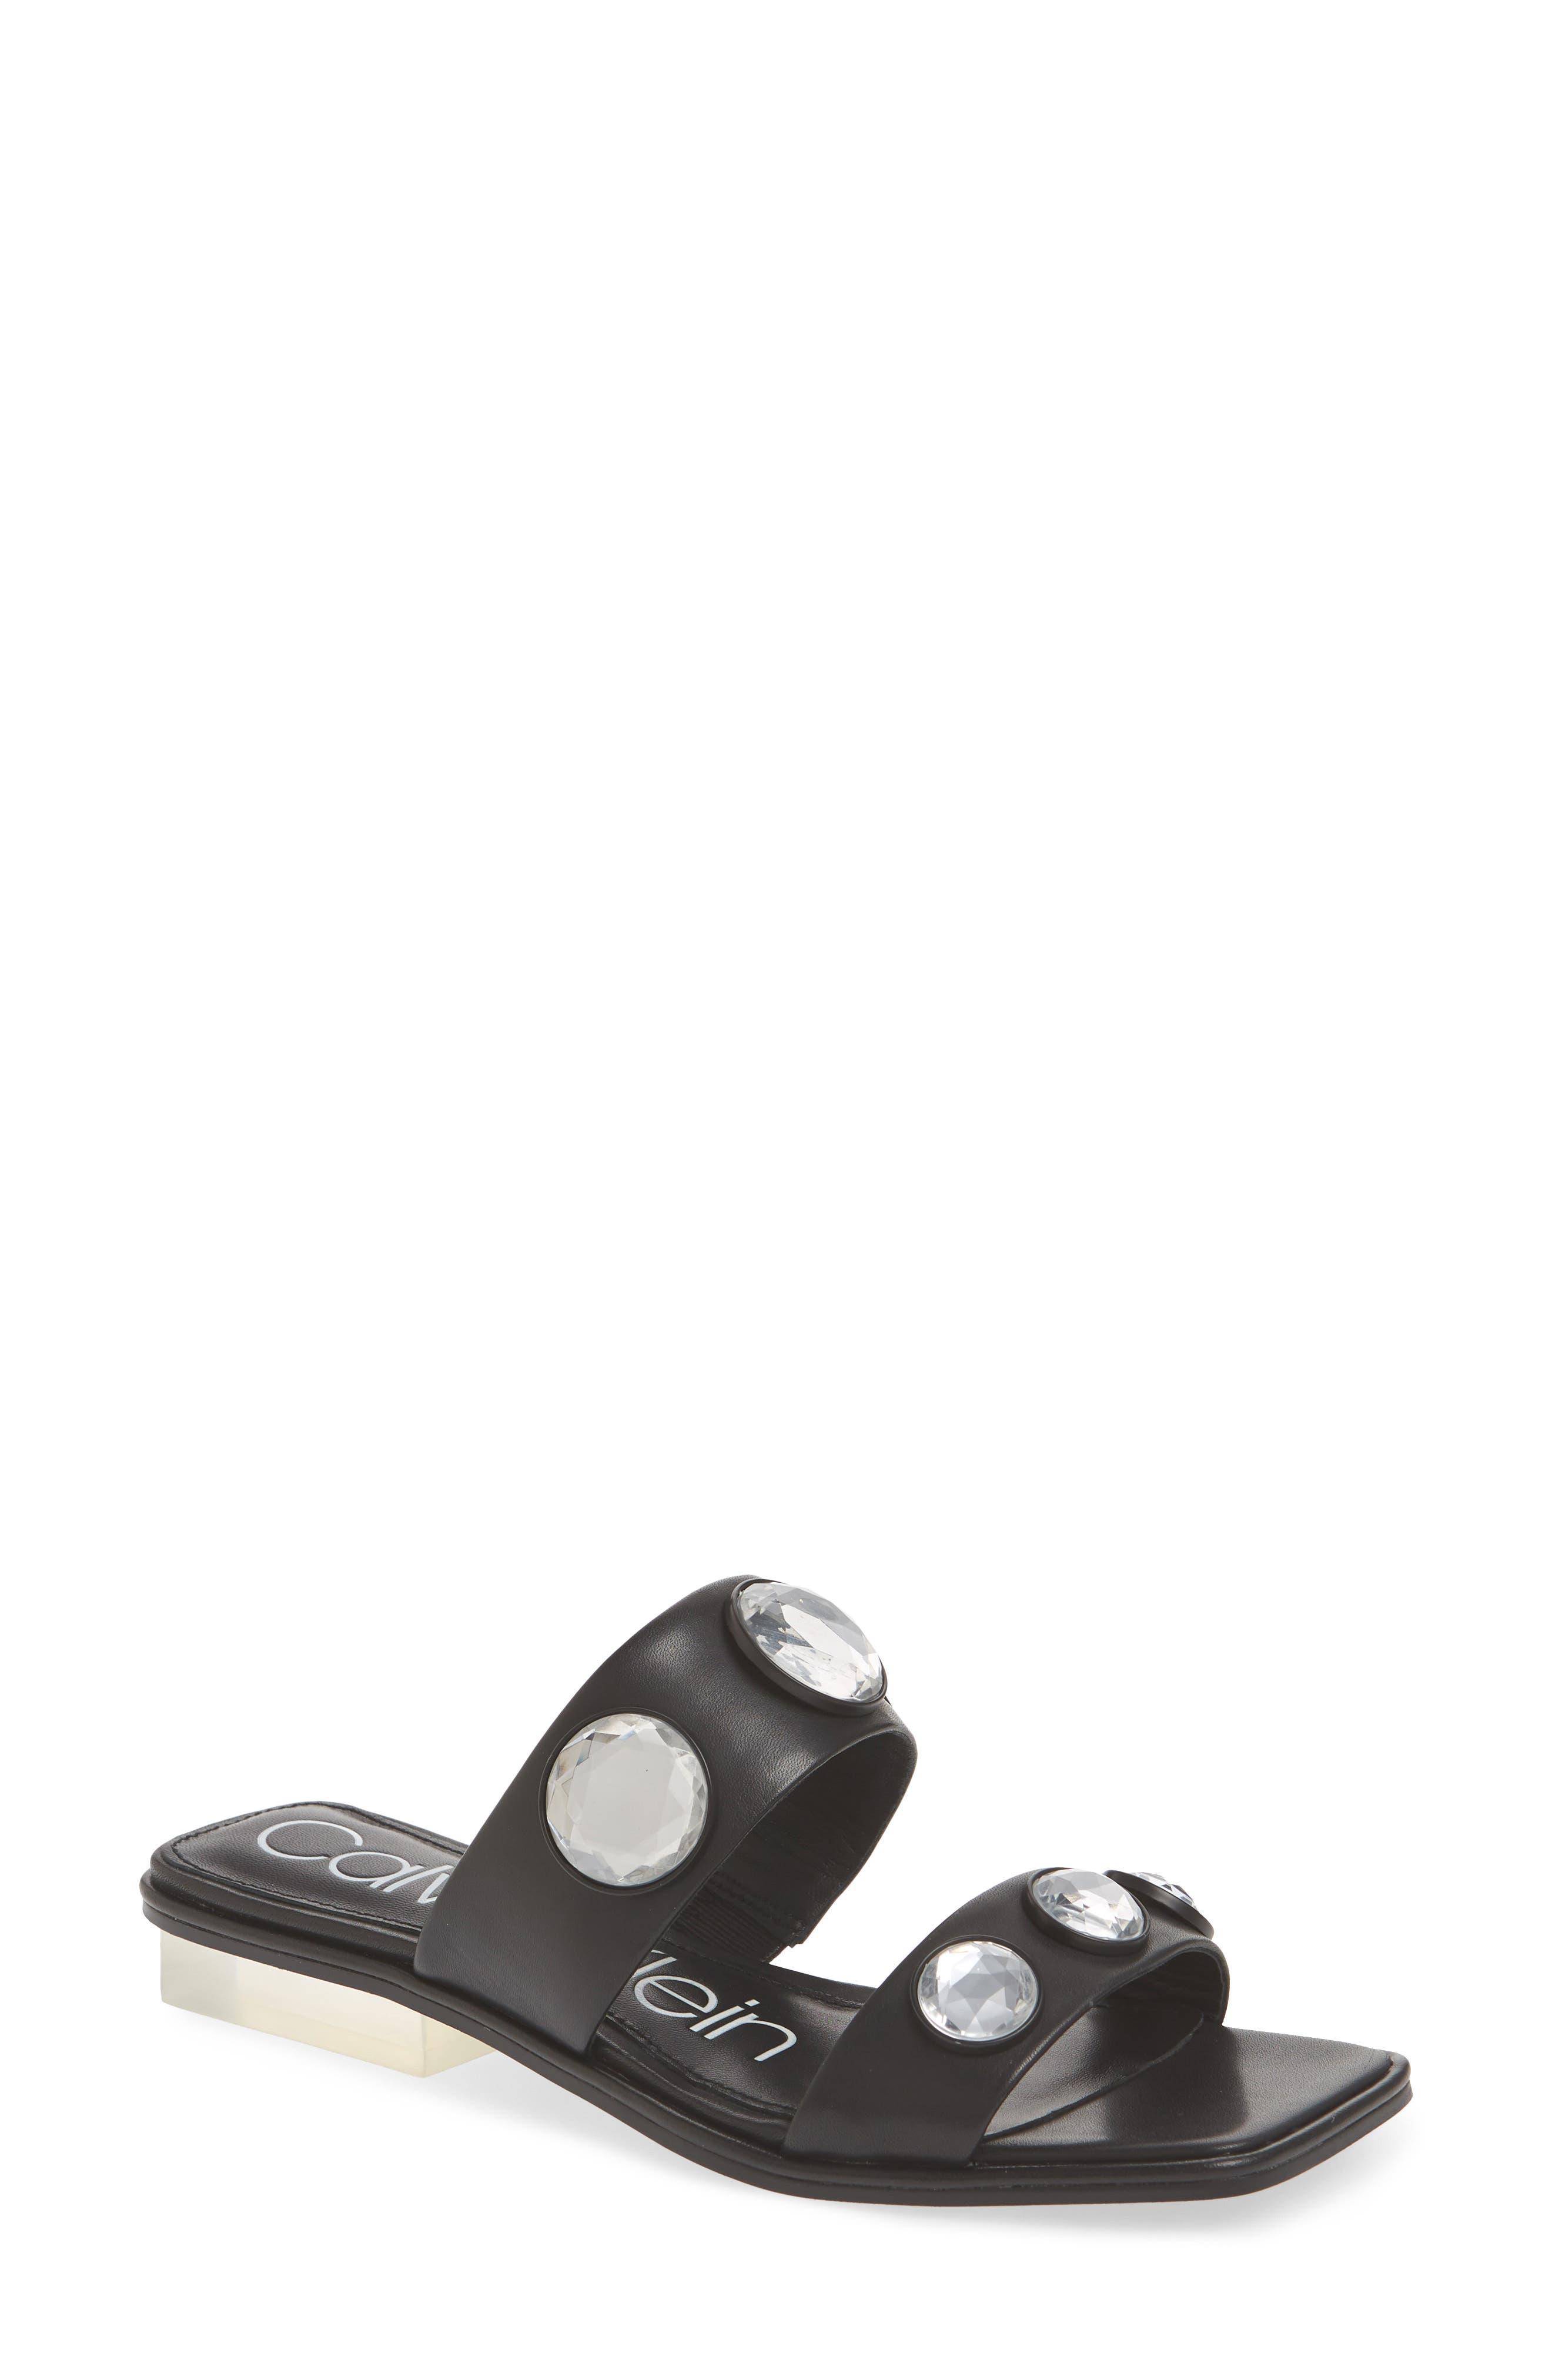 09386e653f8e CALVIN KLEIN Kace Crystal Embellished Slide Sandal